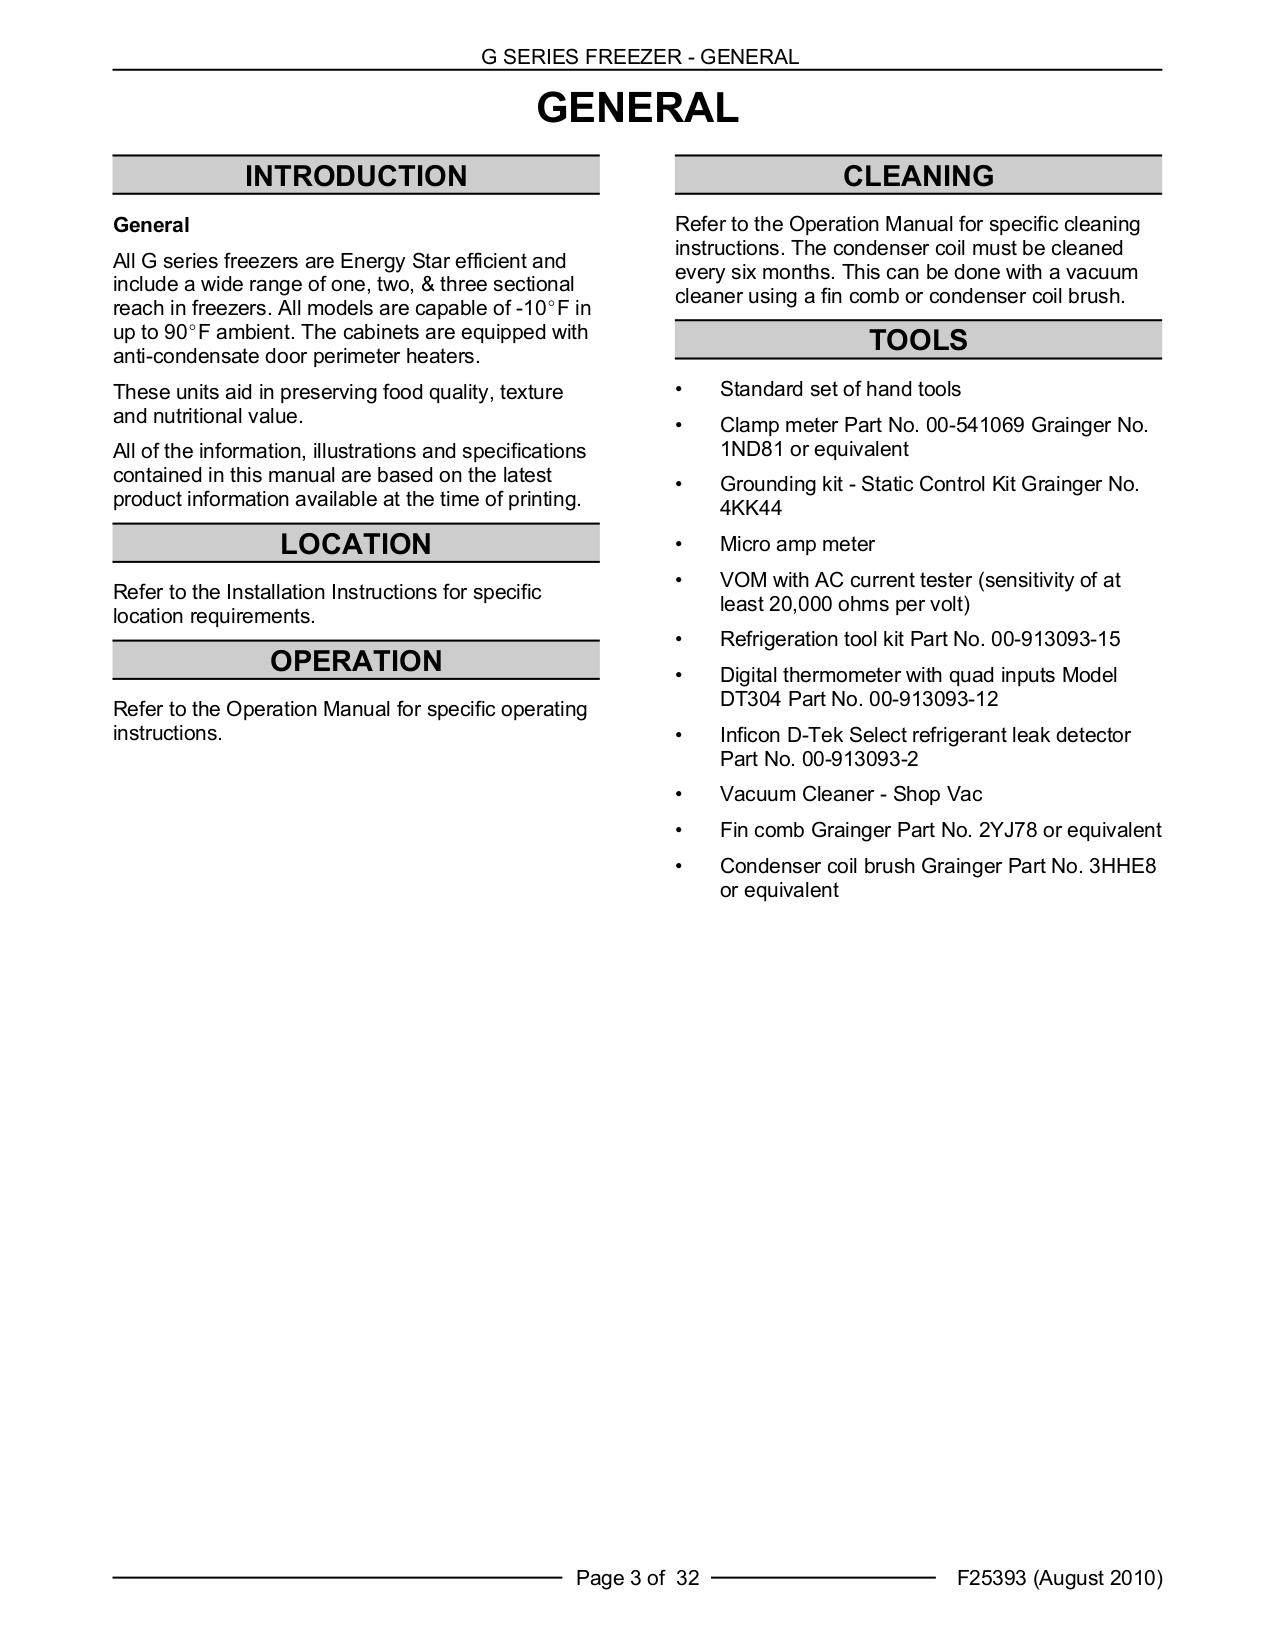 Pdf Manual For Traulsen Refrigerator G12010